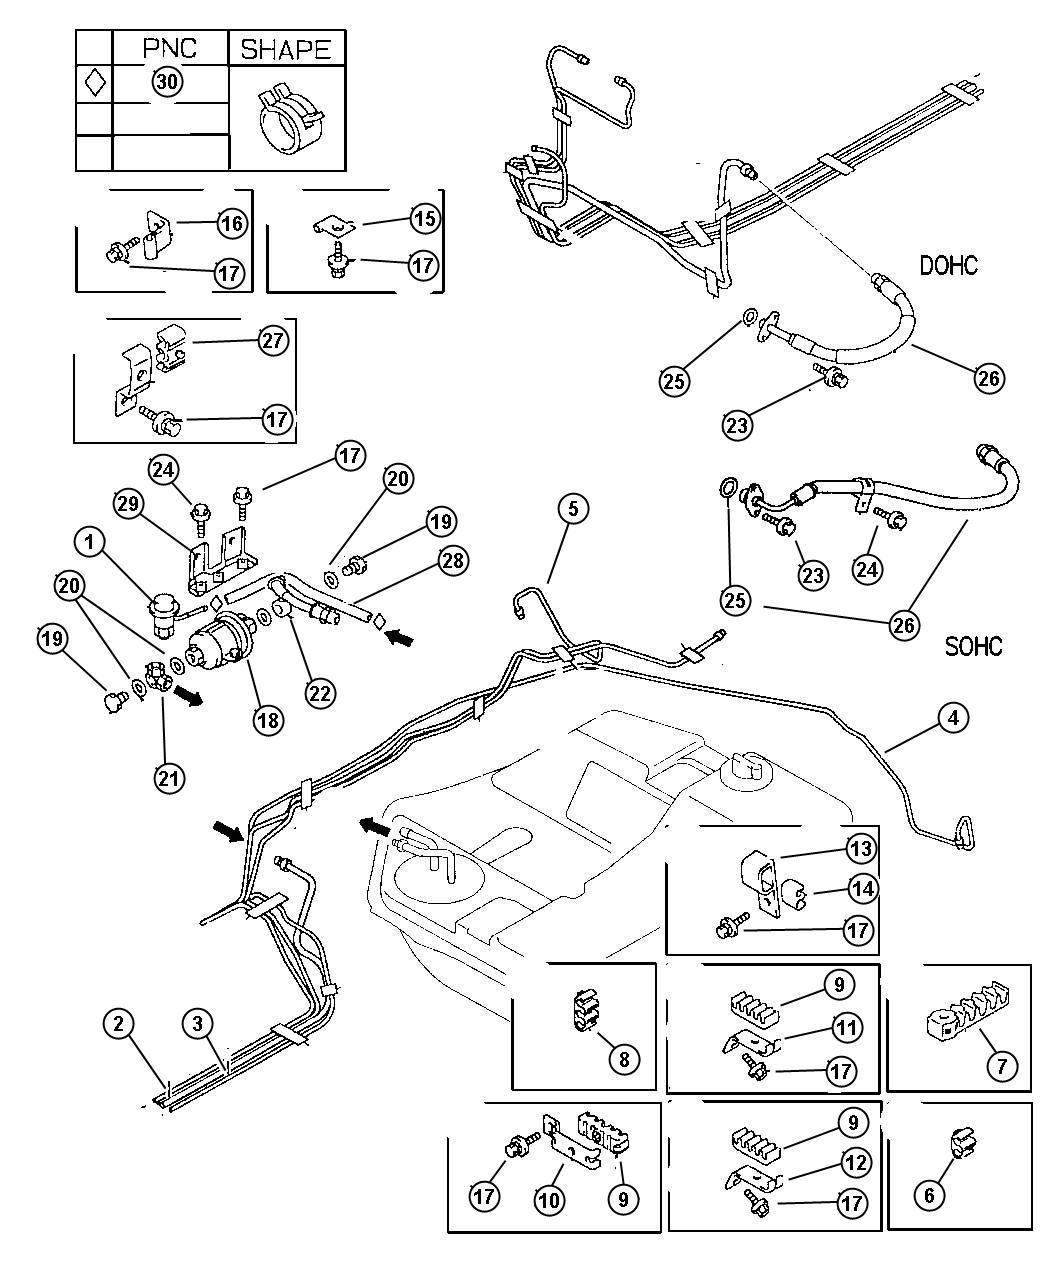 Leaks Gas Diagram Please Of Fuel Line